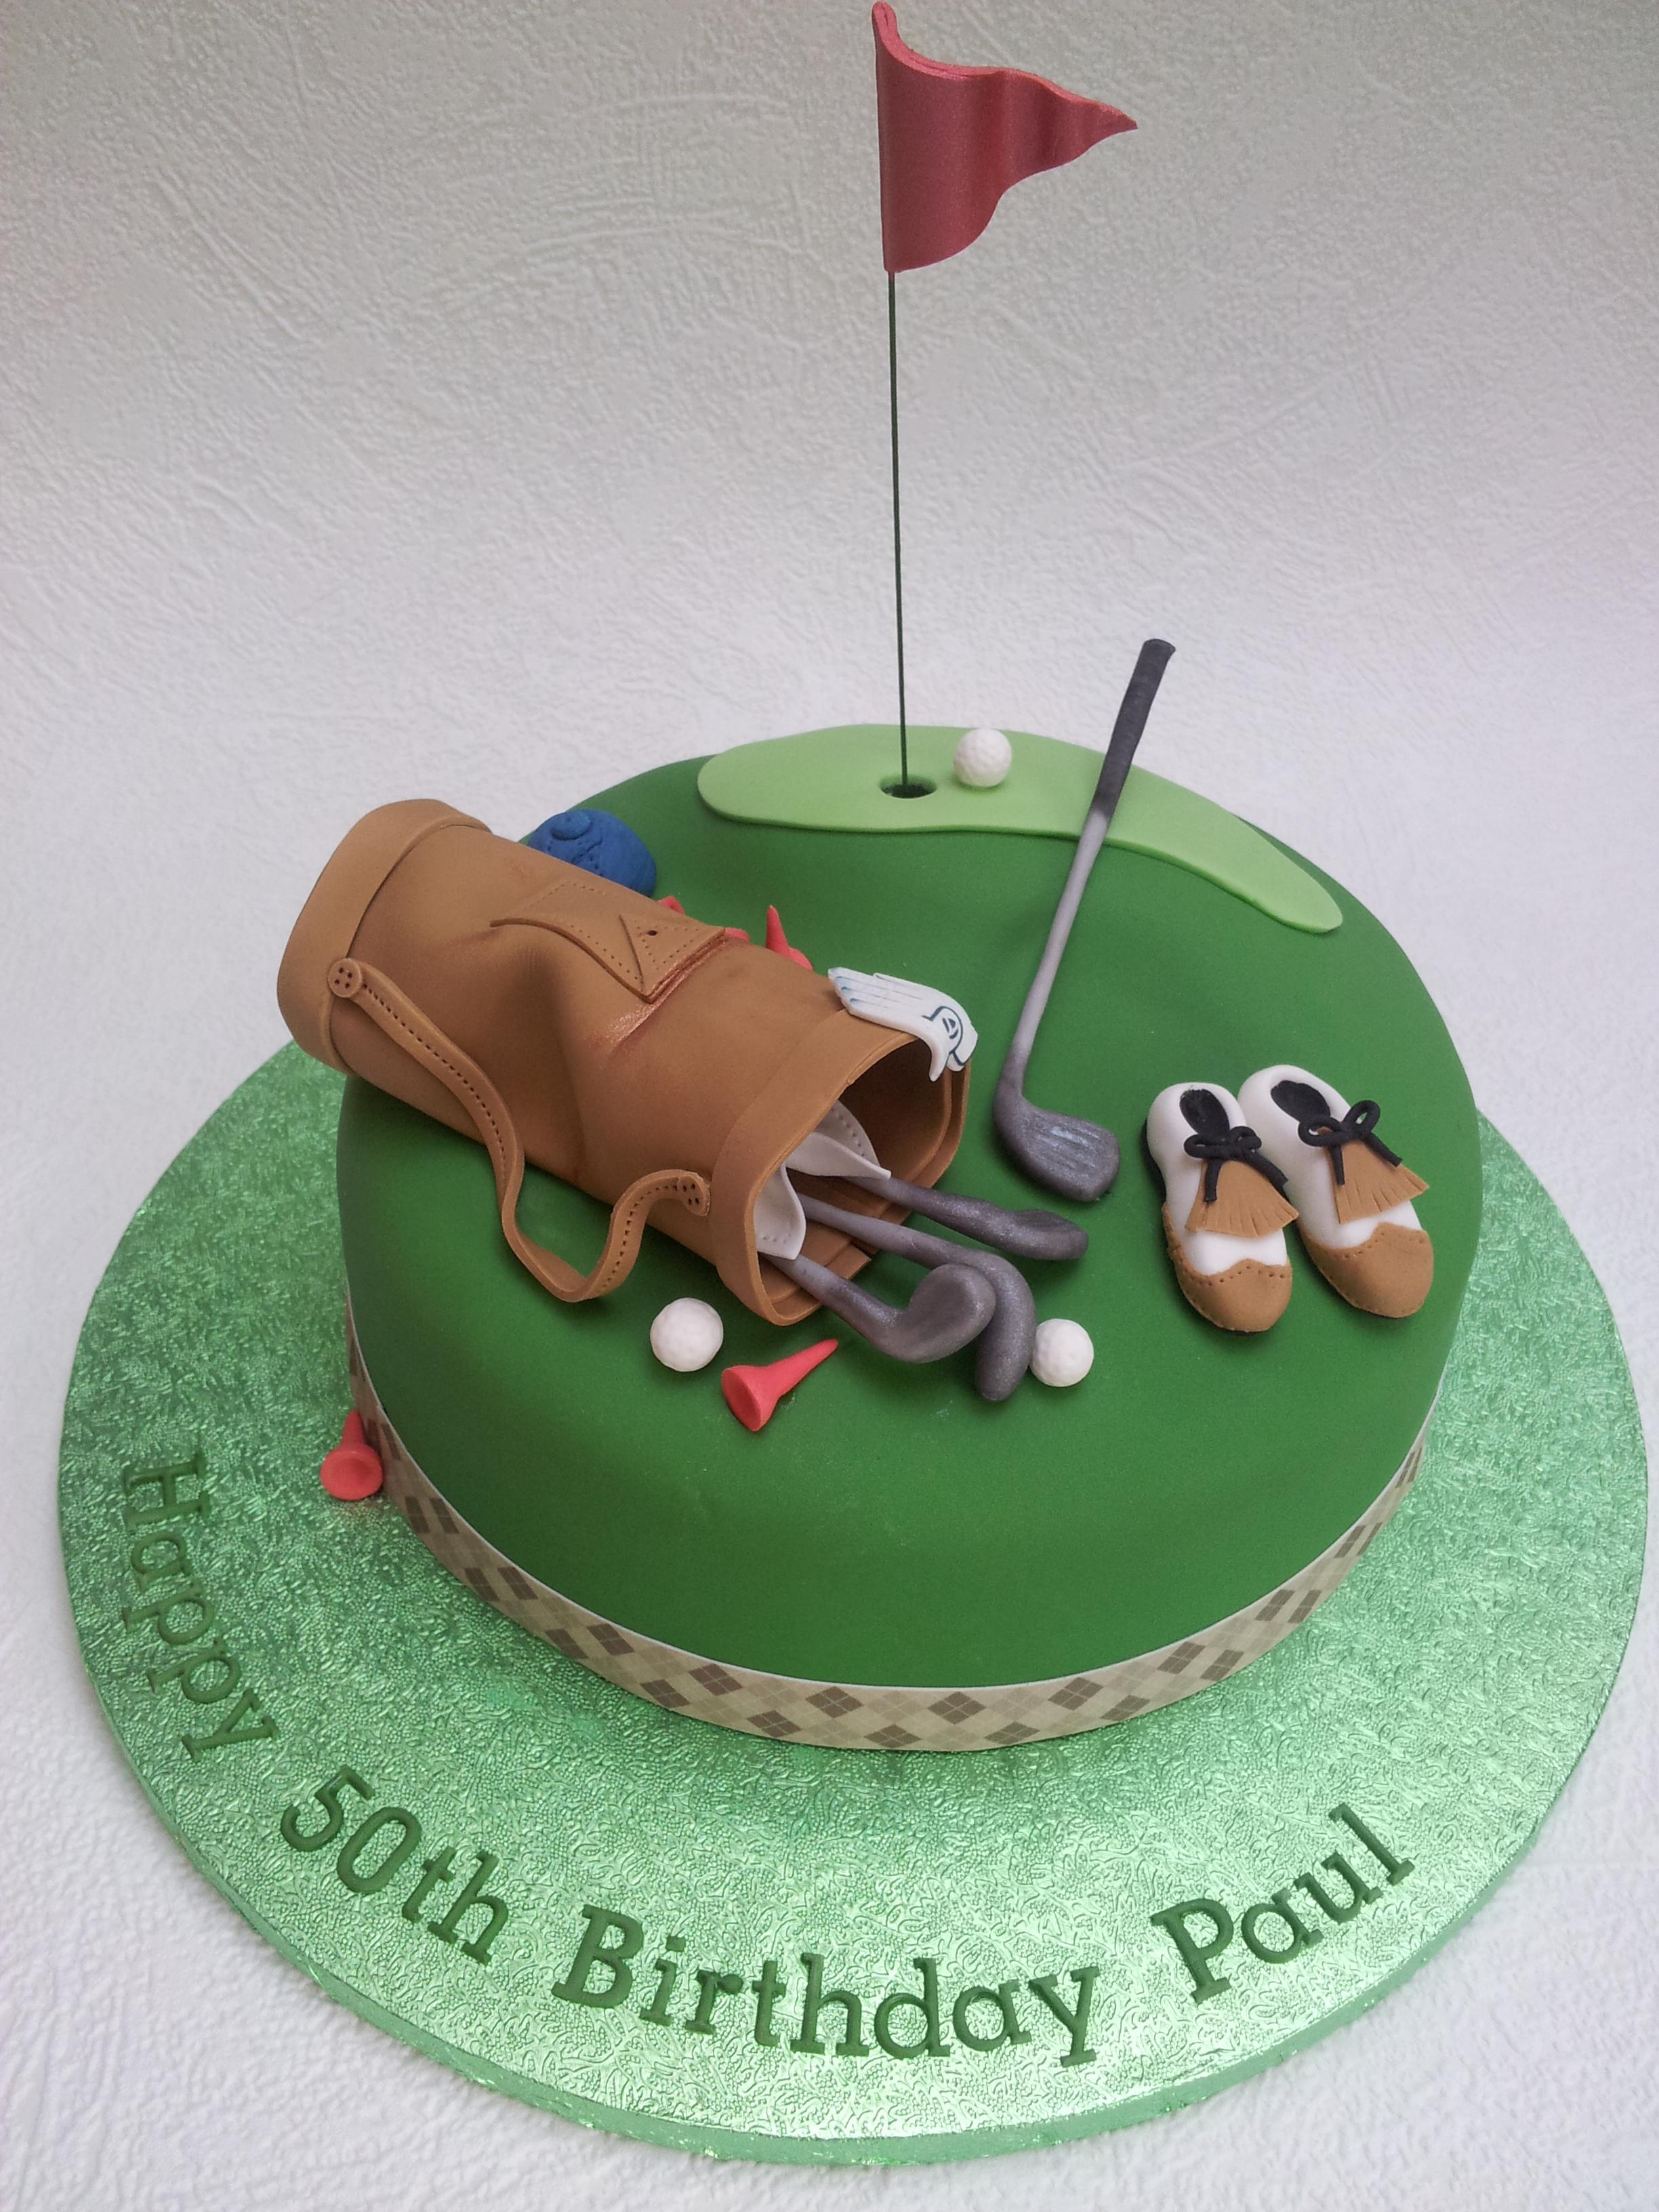 Golf Themed Cake Decorations